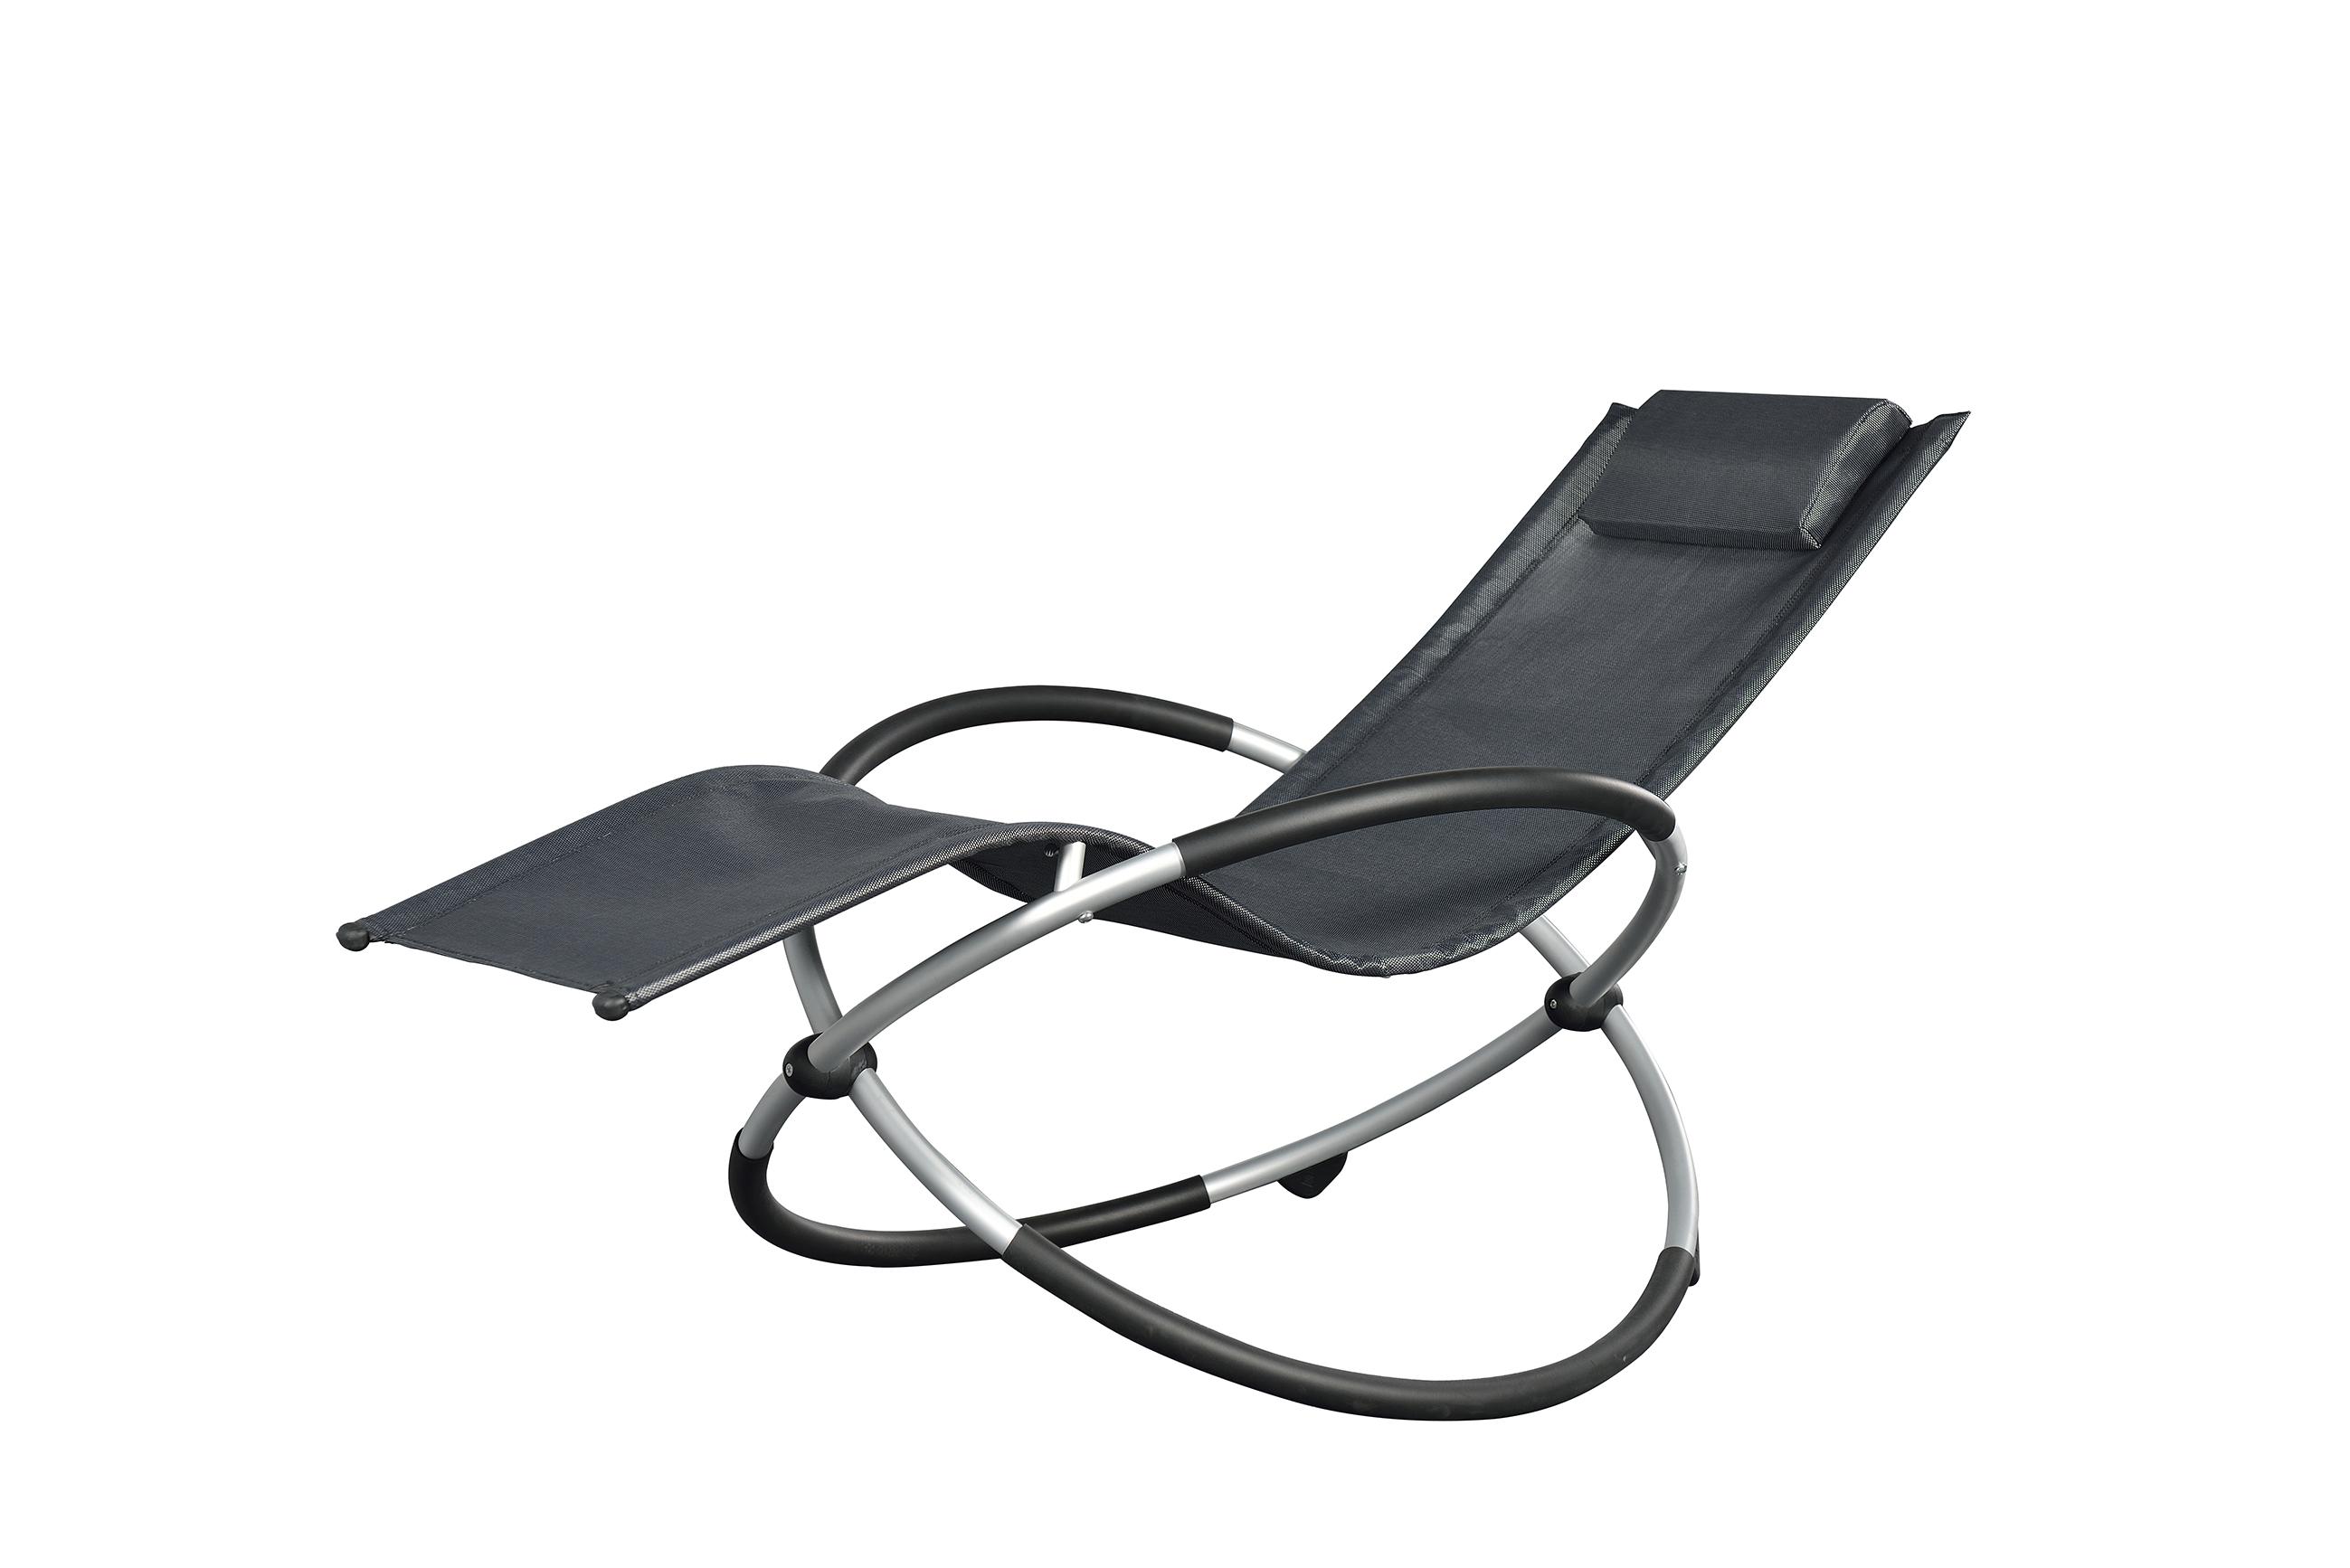 chaise longue relax ellipse gris. Black Bedroom Furniture Sets. Home Design Ideas